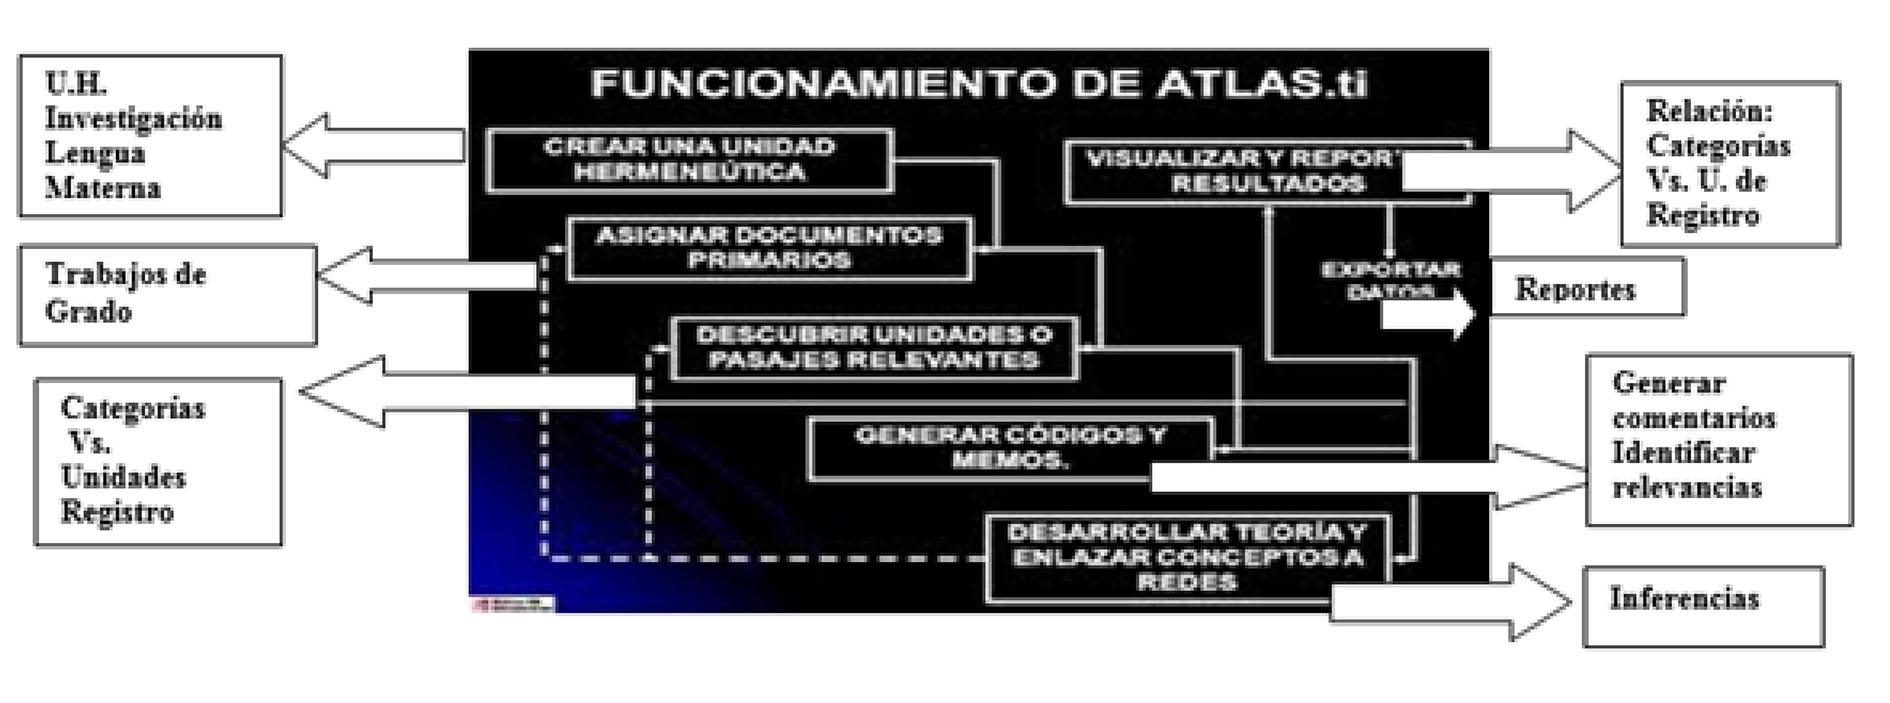 Adaptada de www.google.com/imágenes ATLAS.ti